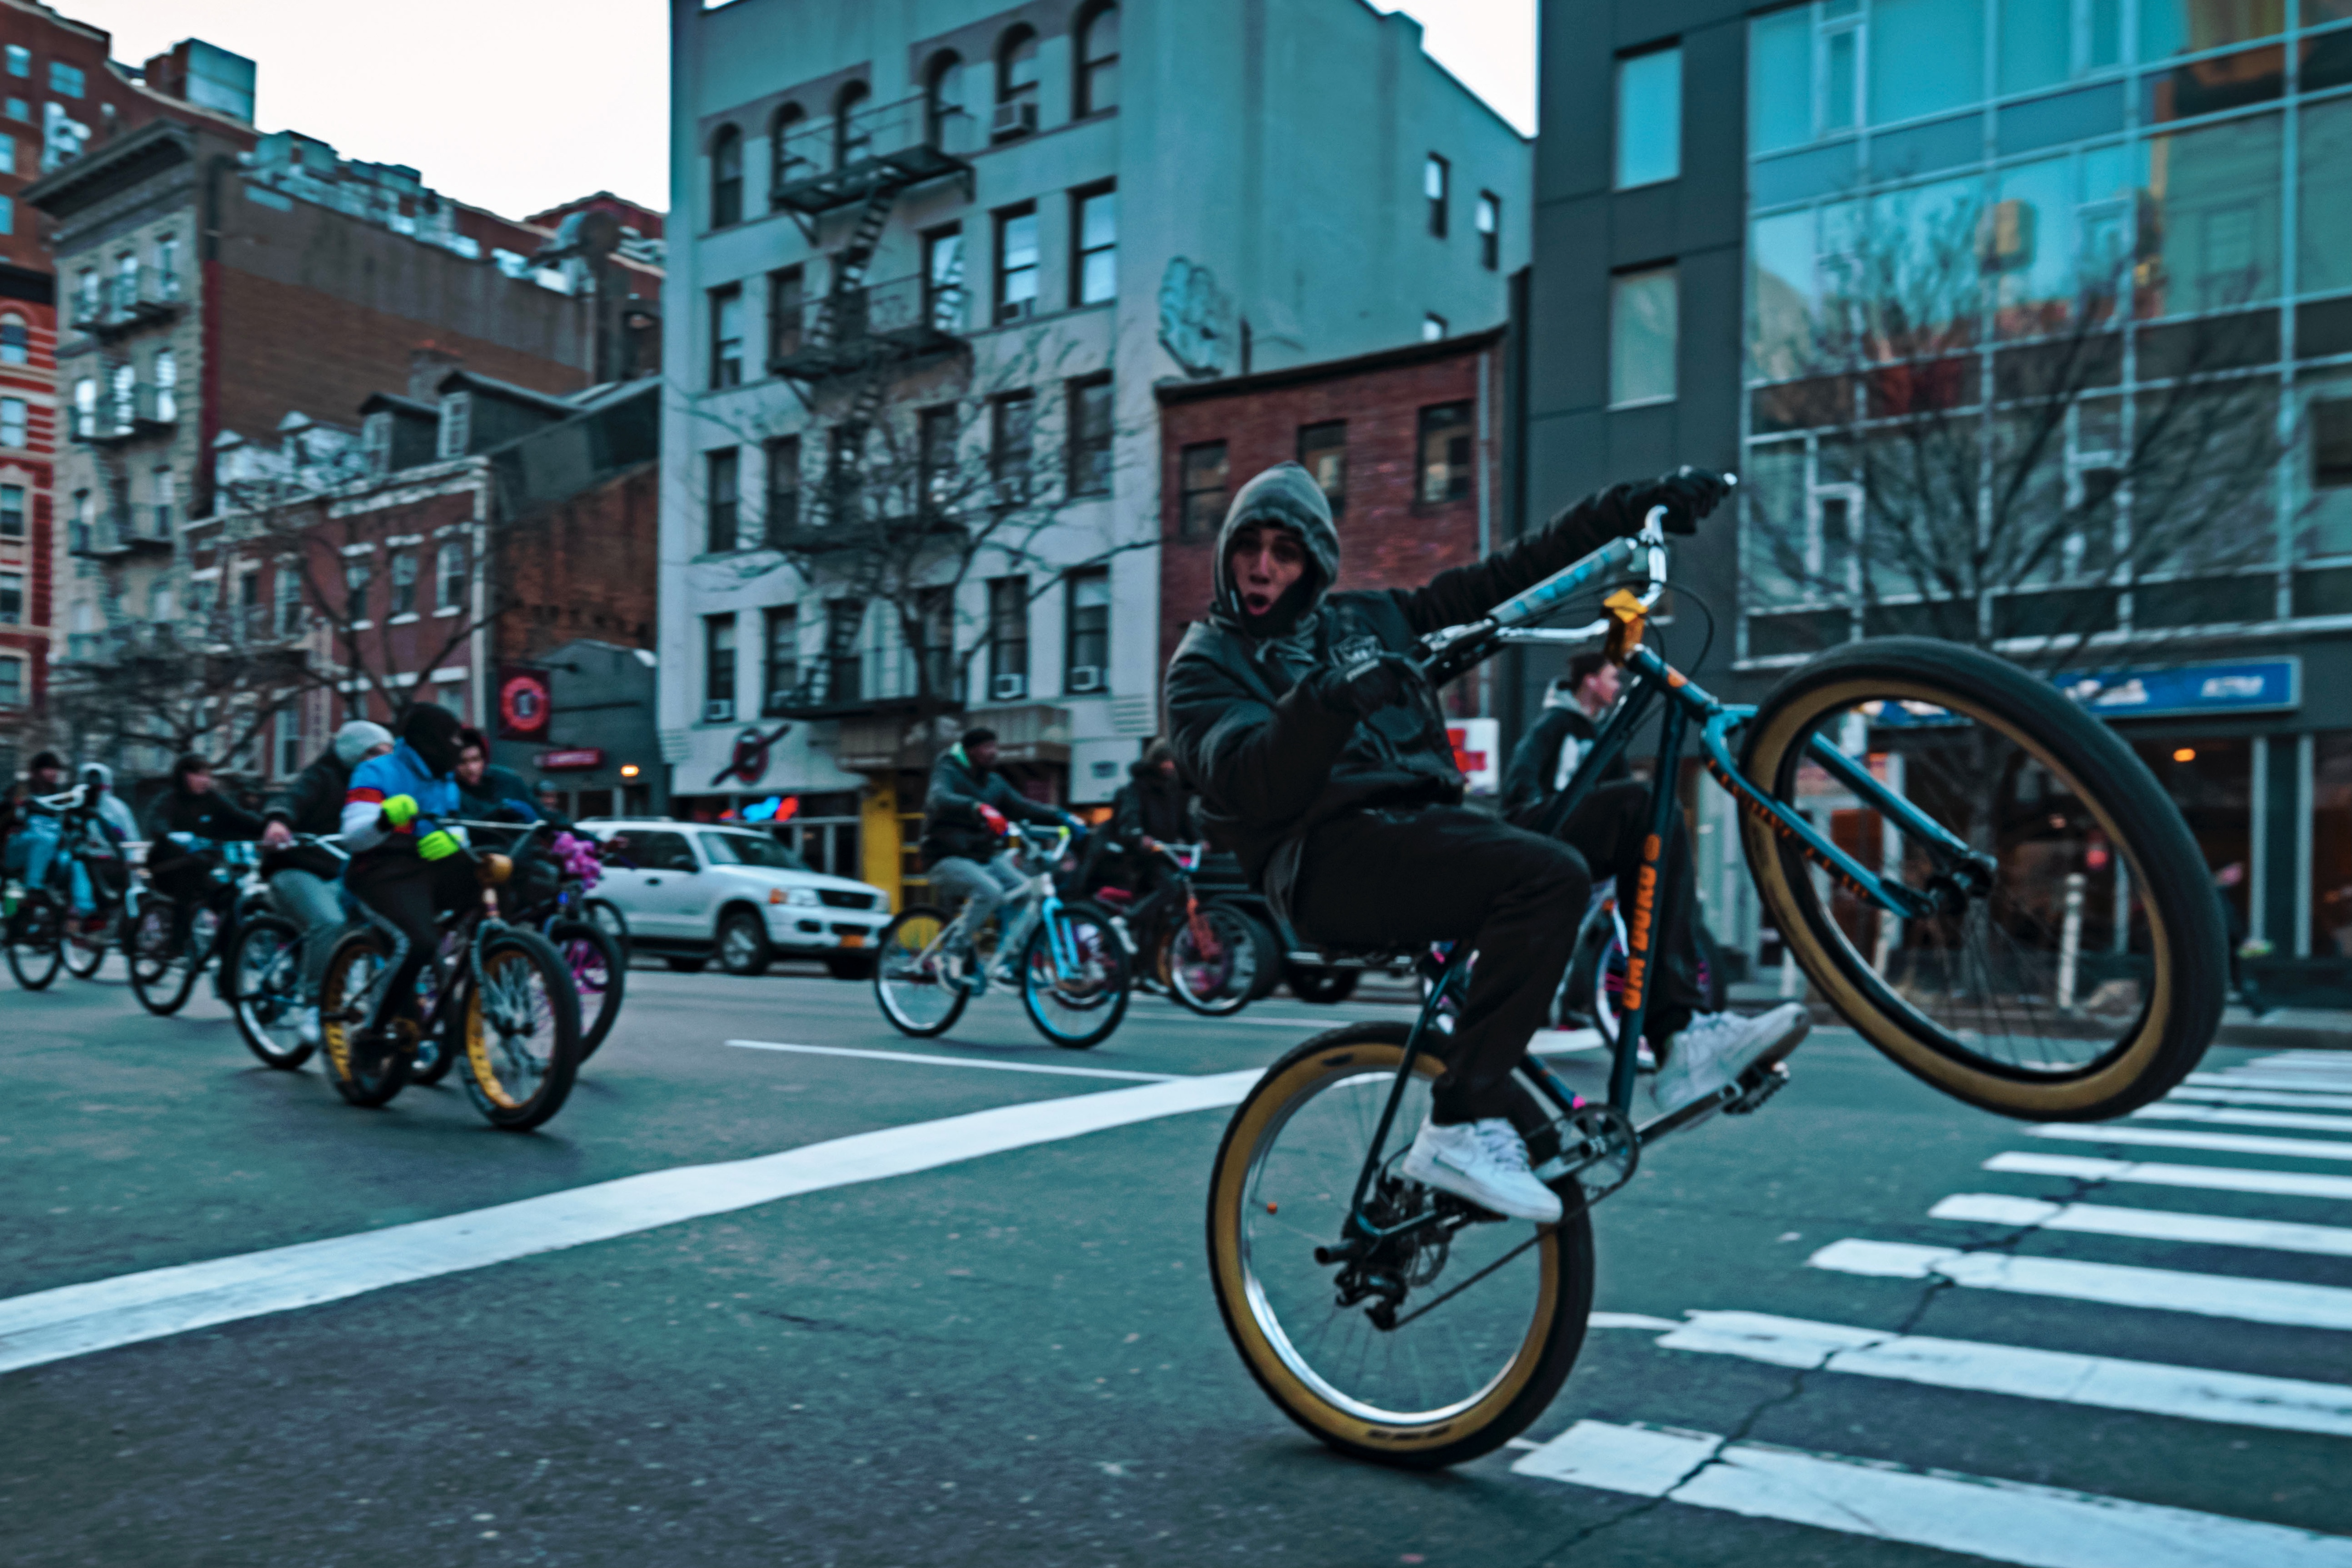 hk_c_街頭單車秀 2020.2.17在紐約曼哈頓街頭拍攝的一張作品。當時恰好一隊單車在街頭呼嘯而過,他們鼓噪着、喧囂張揚,路過的行人與車輛都停下來為他們讓路。這位騎者見我拍照,特意提起車頭向我炫技,然後大笑而去。我想這就是美國文化的一種表現,個性張揚、宣揚自由,以及整個社會的包容。 LilyZhang 張莉.jpeg